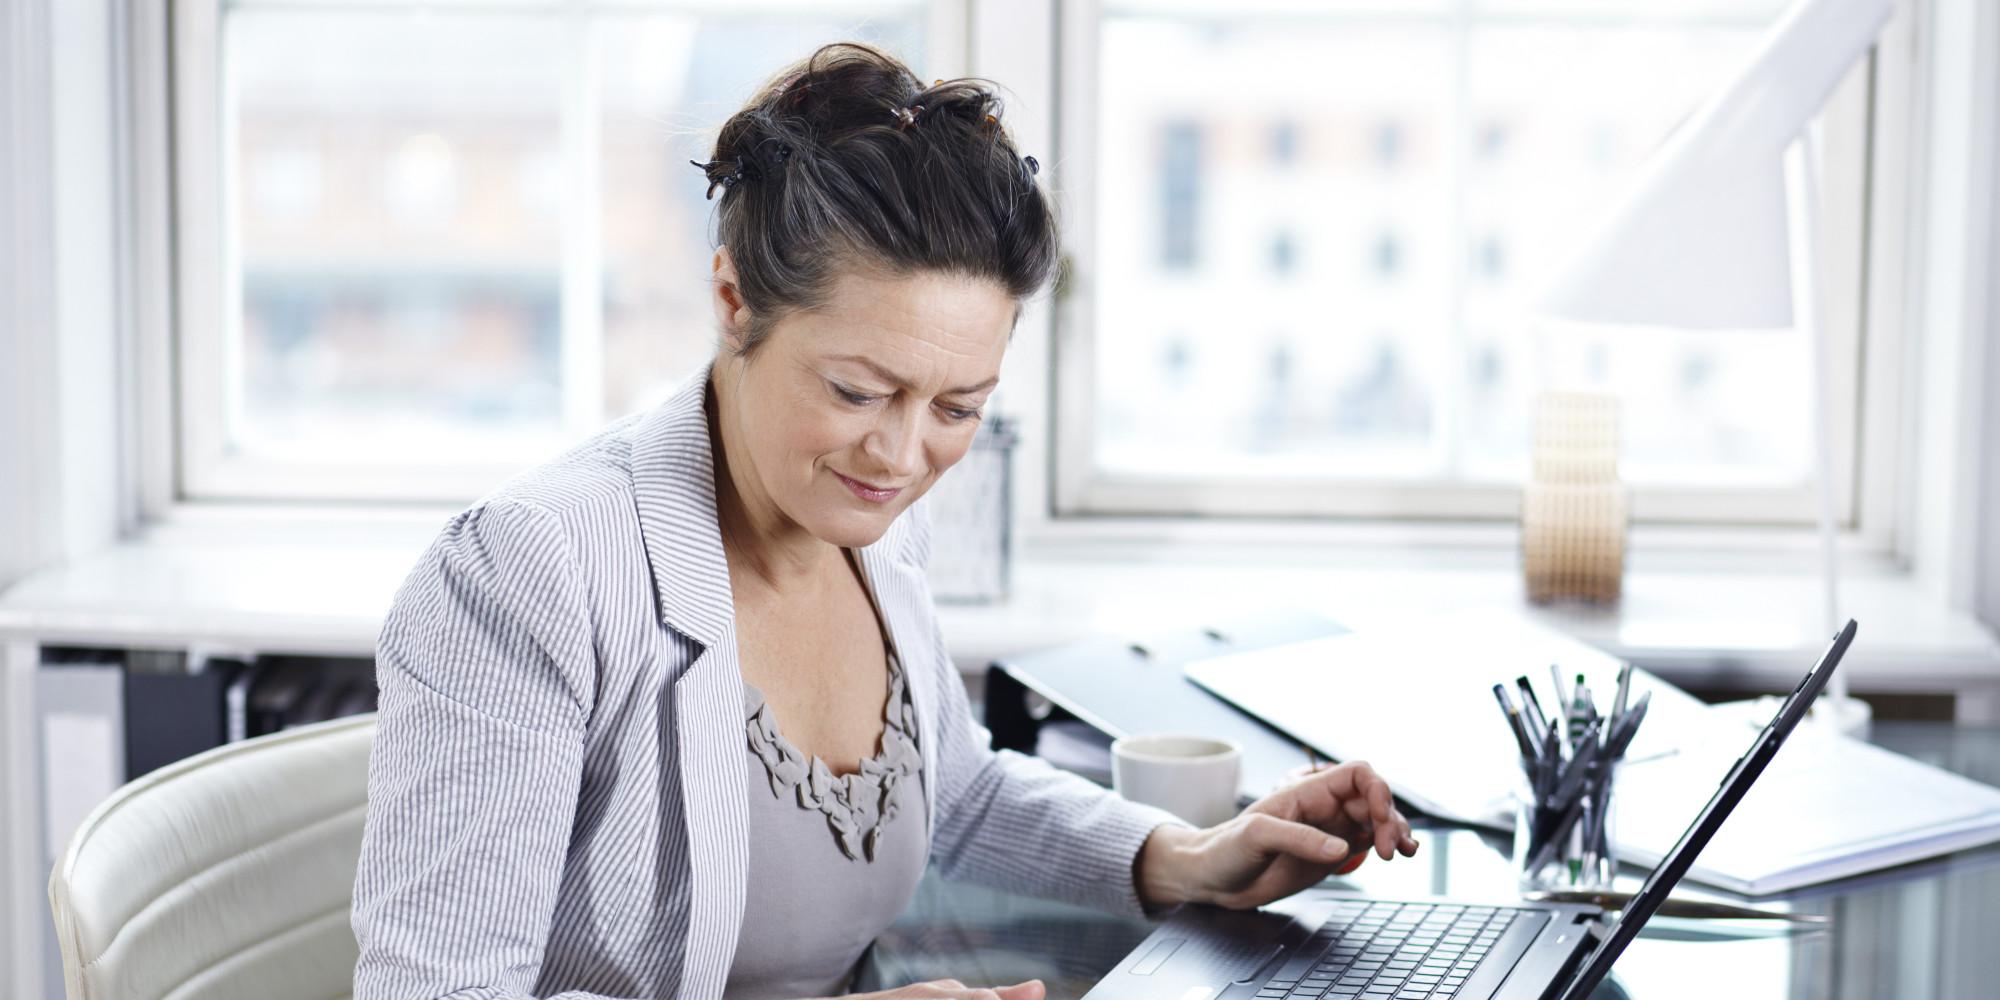 Mature woman using calculator